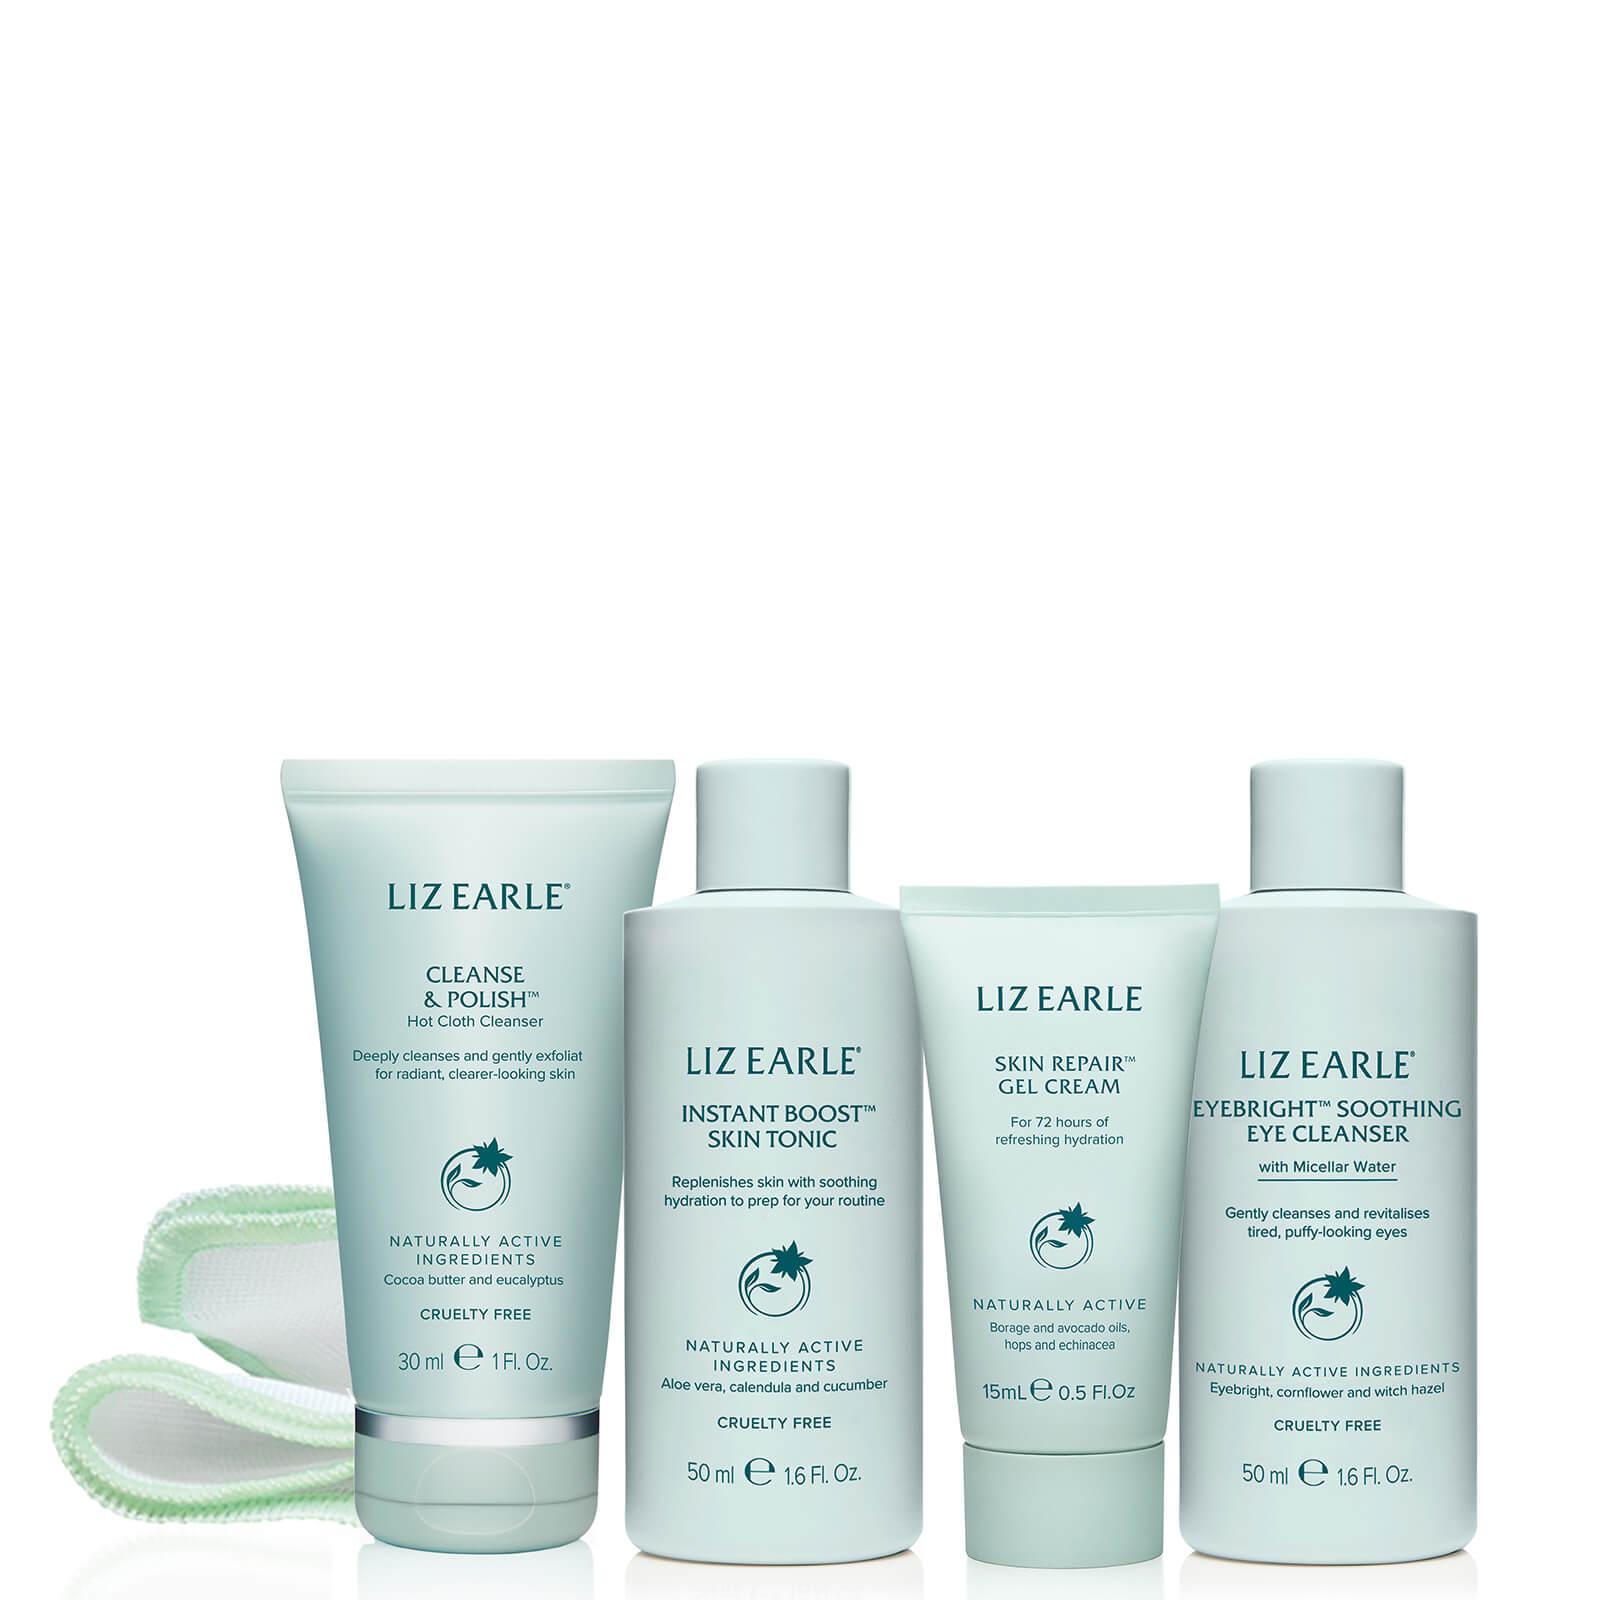 Купить Liz Earle Your Daily Routine with Skin Repair Gel Cream Try-Me Kit